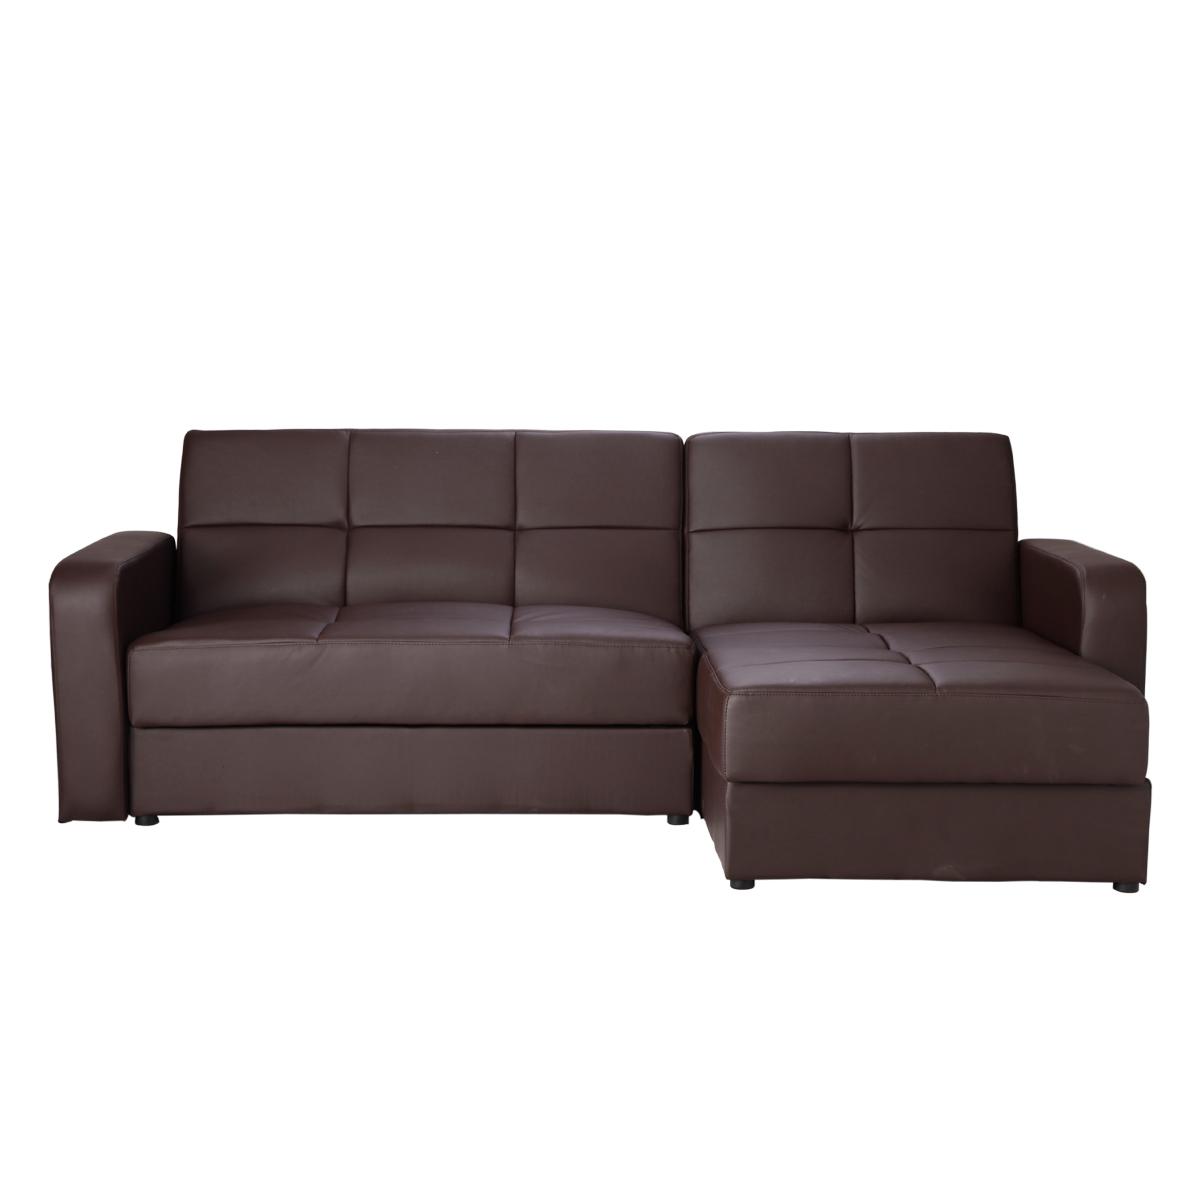 Black Leather Corner Sofa Ebay: Brand New Leather Corner Sofa Bed